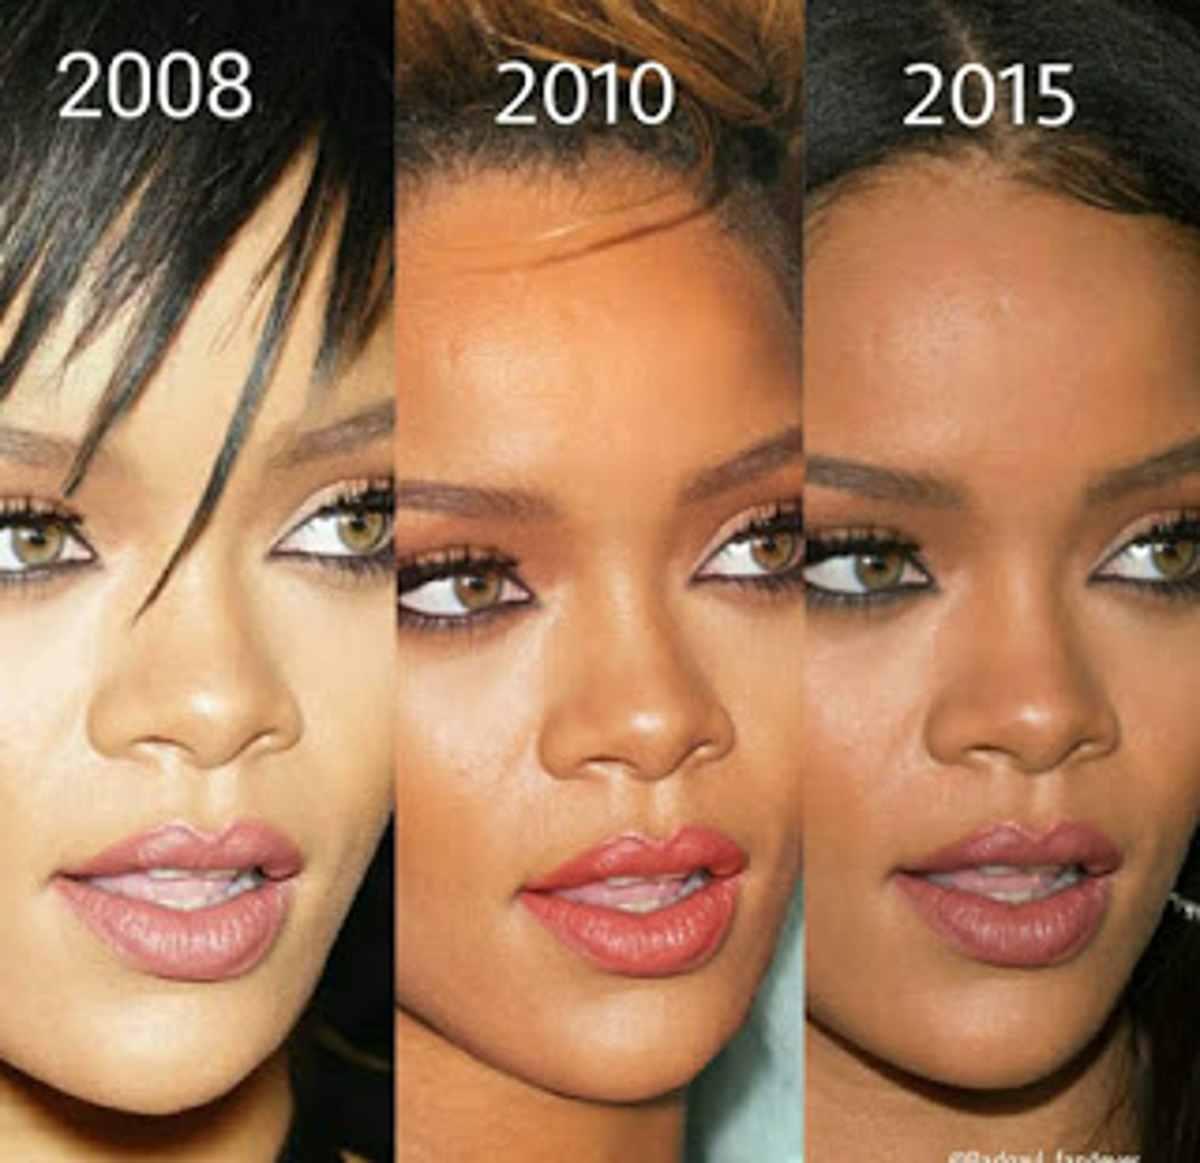 Rihanna-si-è-rifatta?